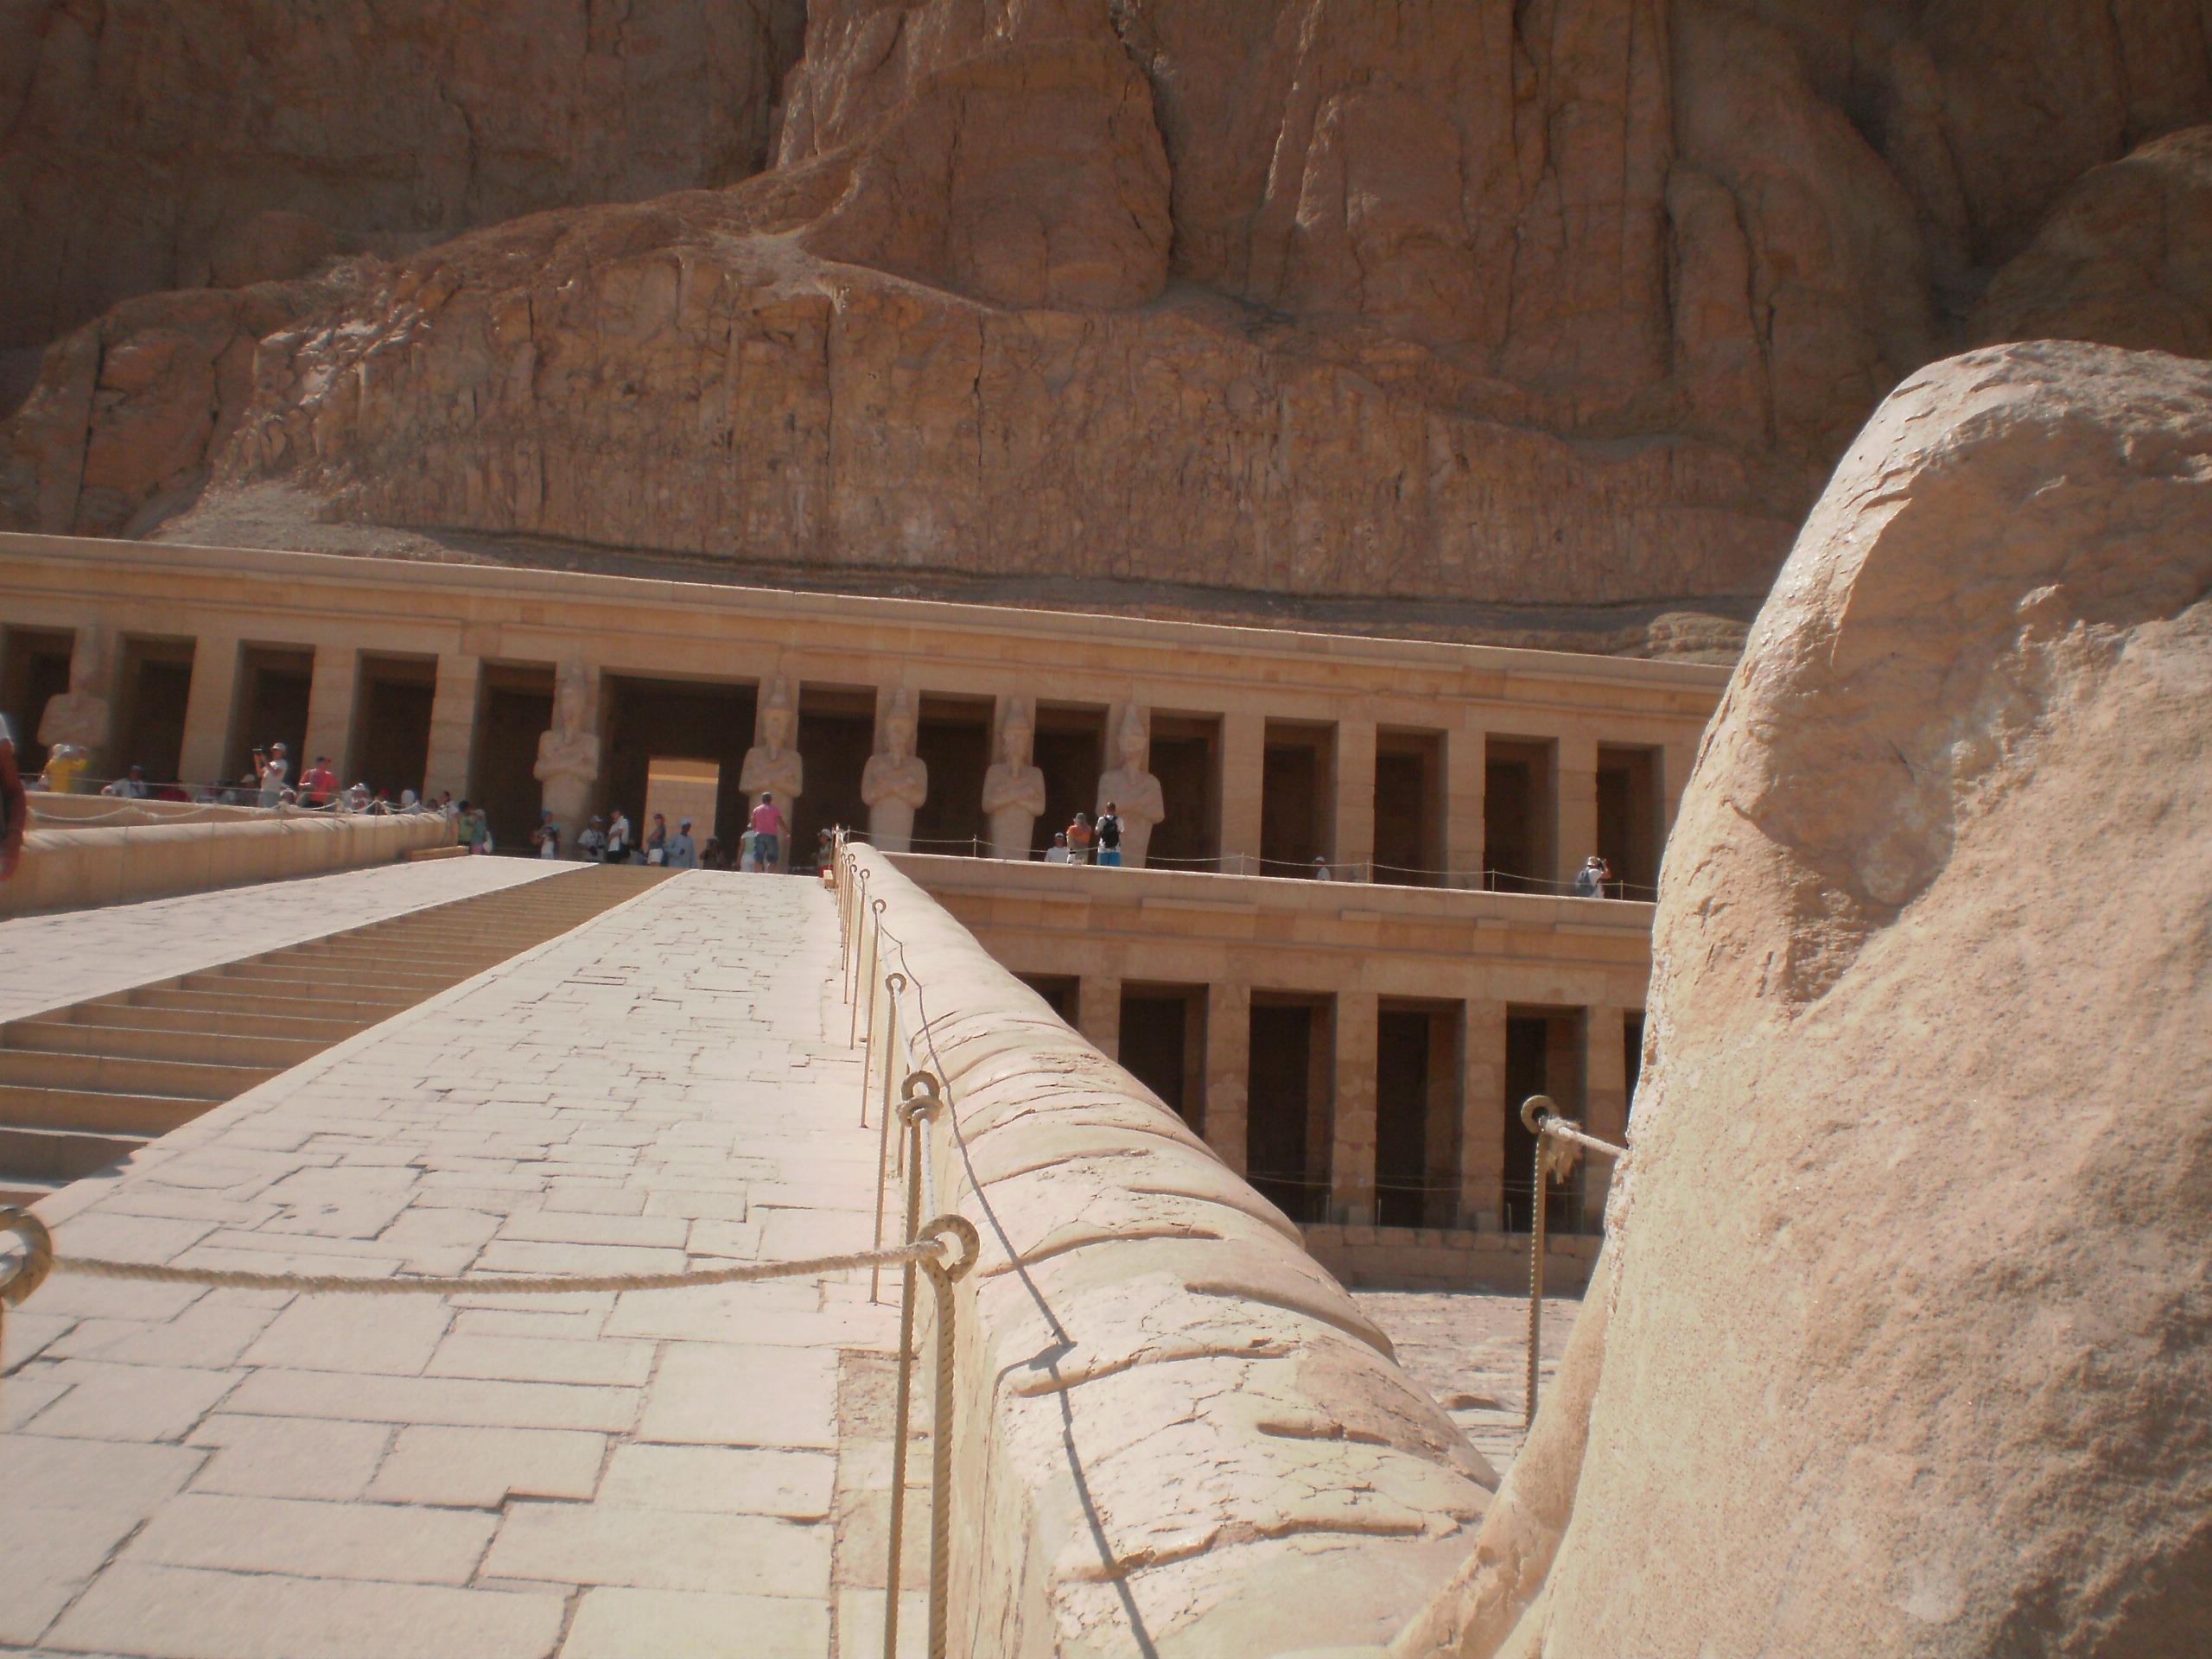 letovanje/egipat/egipat-hram-kraljice-hatsepsut1.JPG